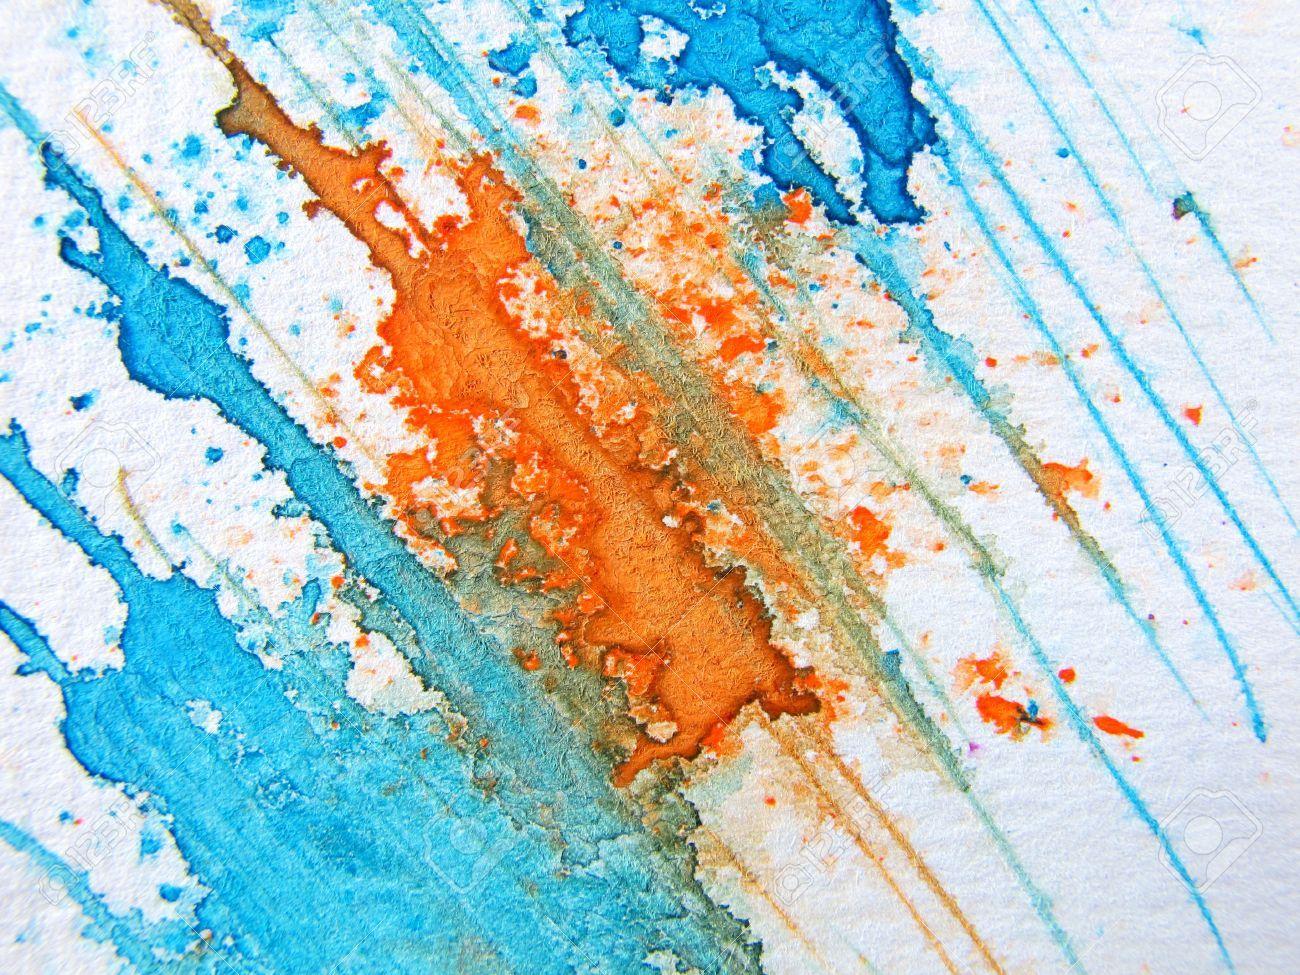 Aquarelle Blue Orange Recherche Google Blue Orange Abstract